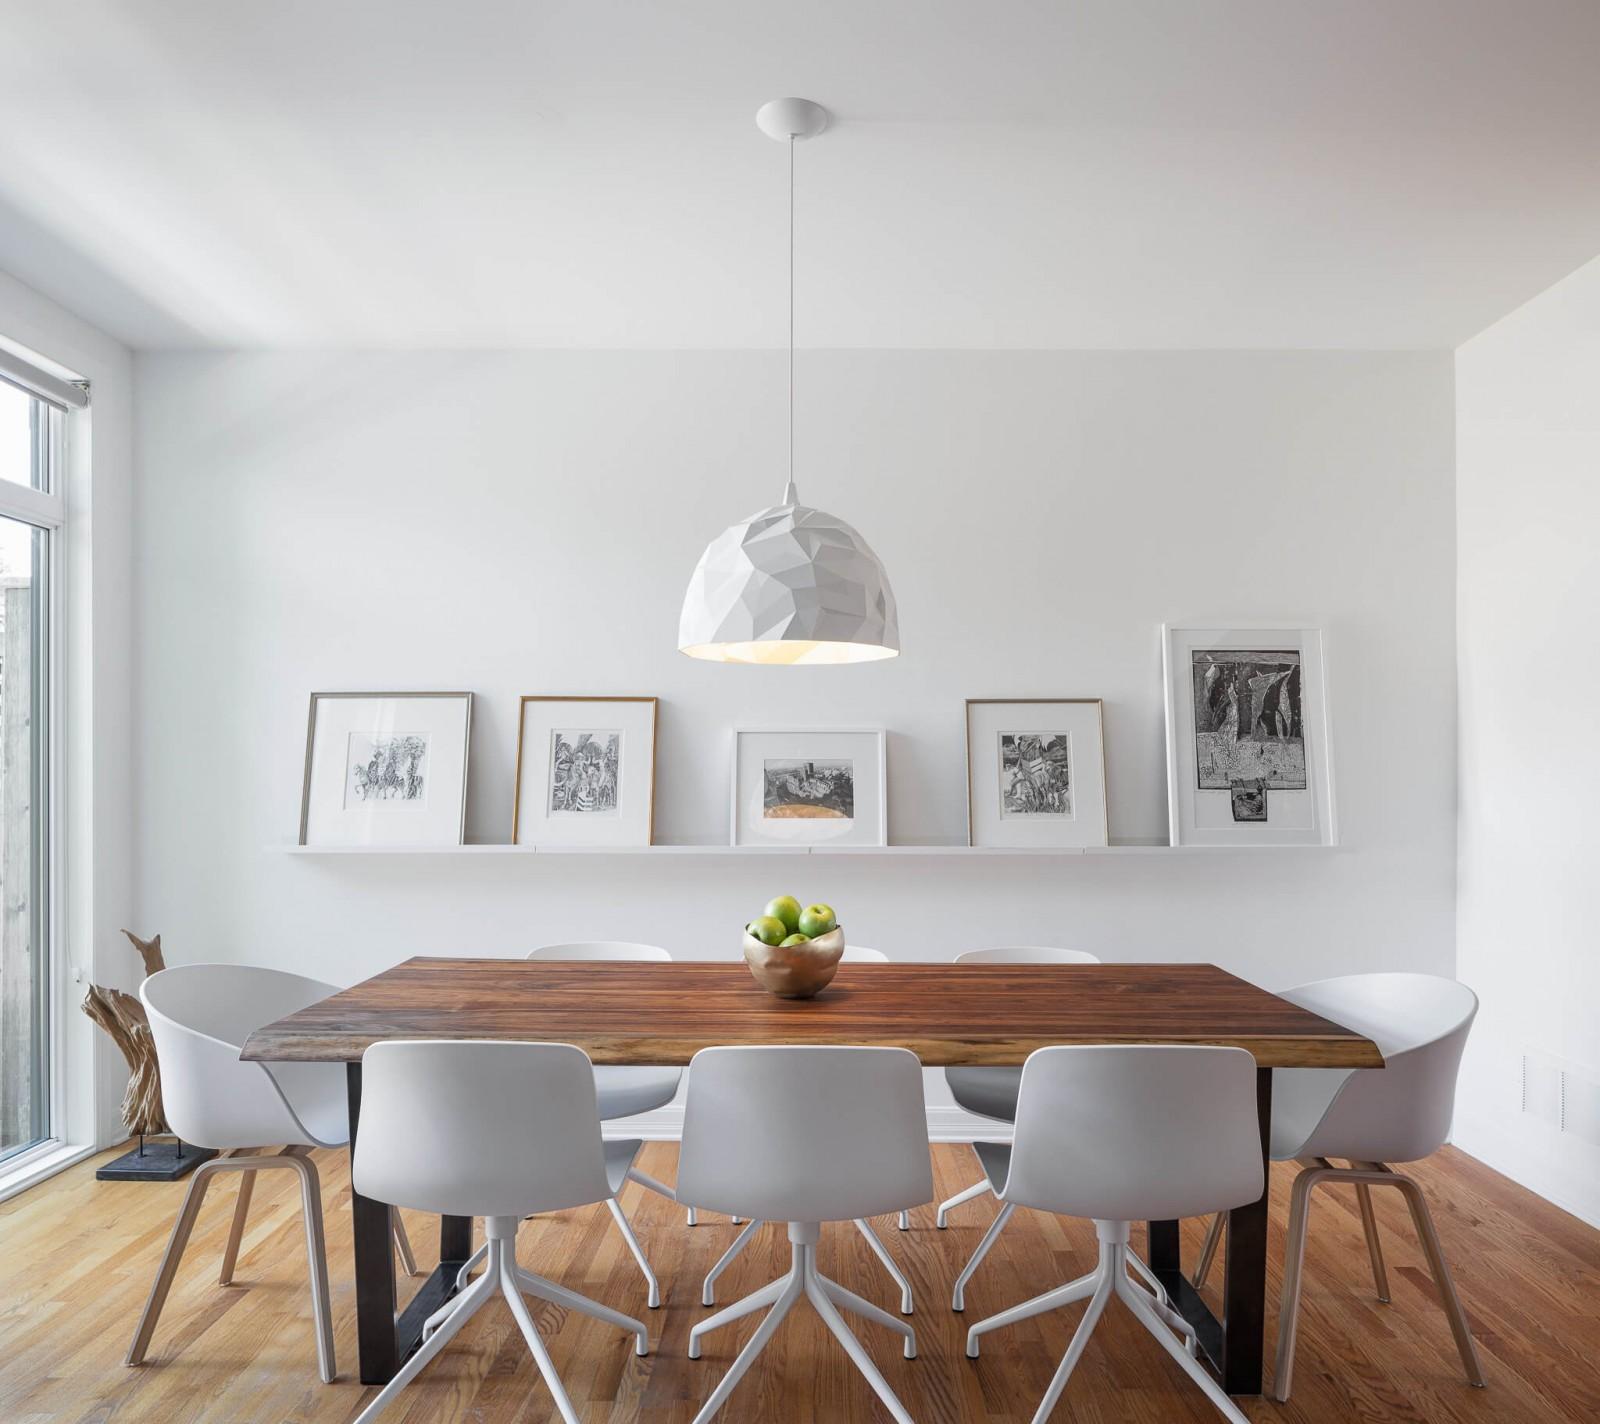 Ottawa-architectural-Photographer-Justin-Van-Leeuwen-345Berkley-14-Pano-Edit